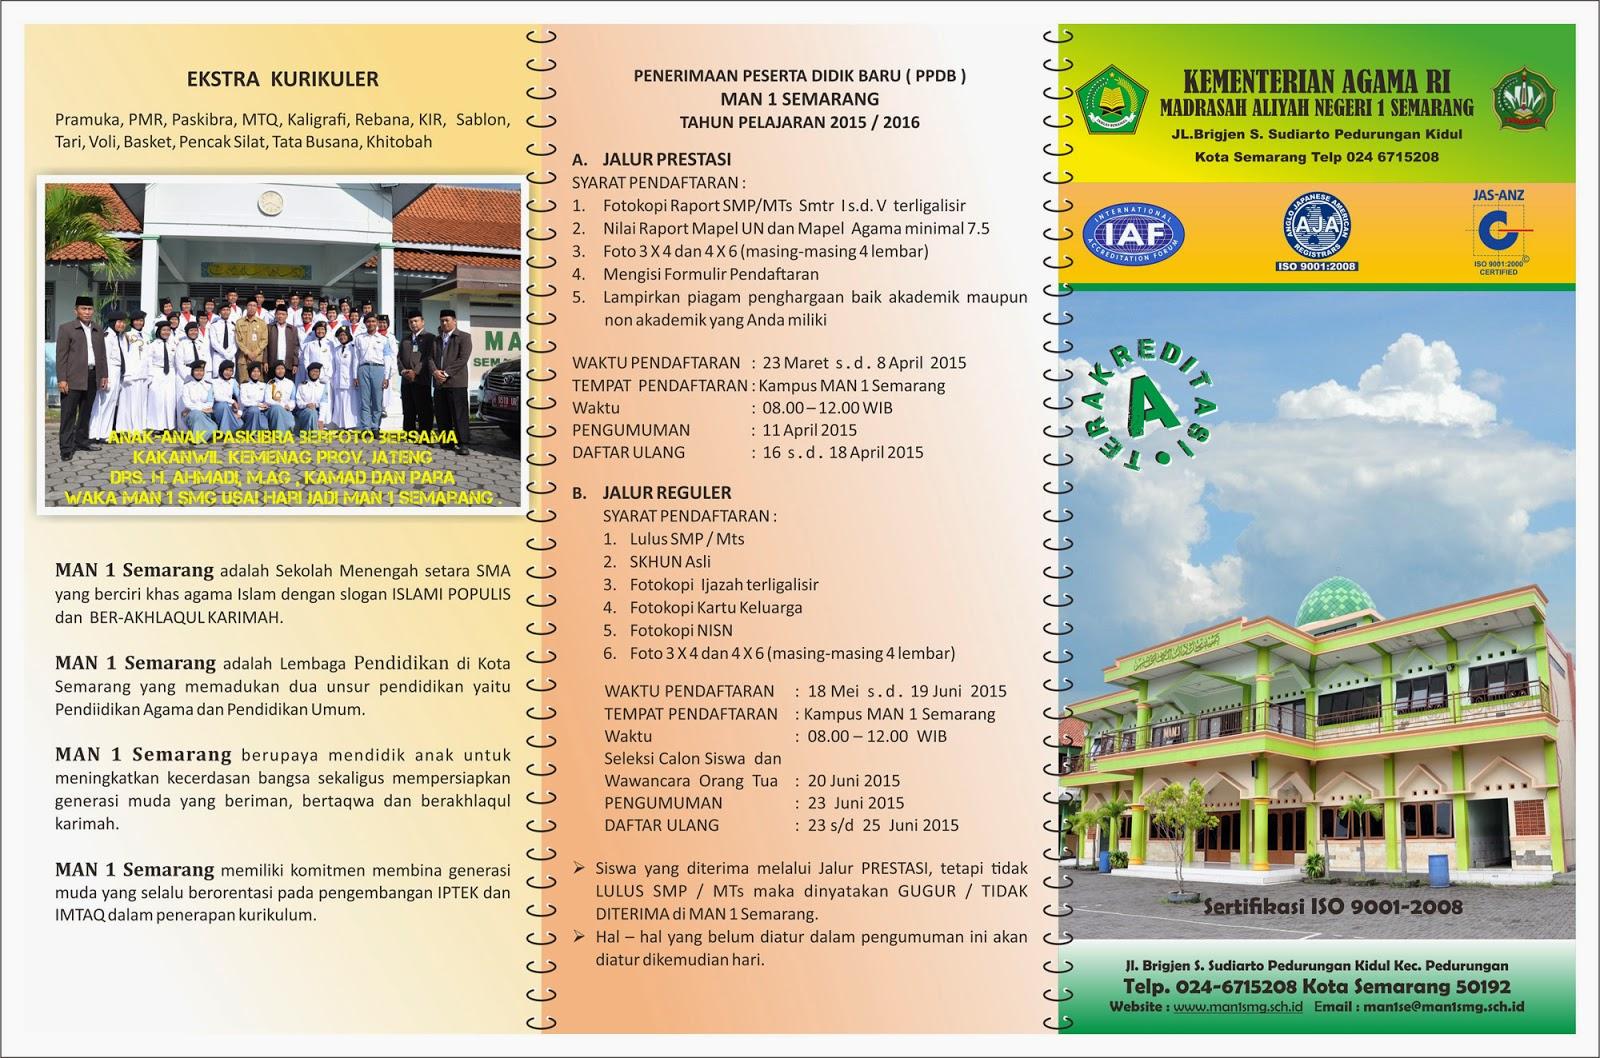 Brosur Pendaftaran MAN 1 Semarang 2015